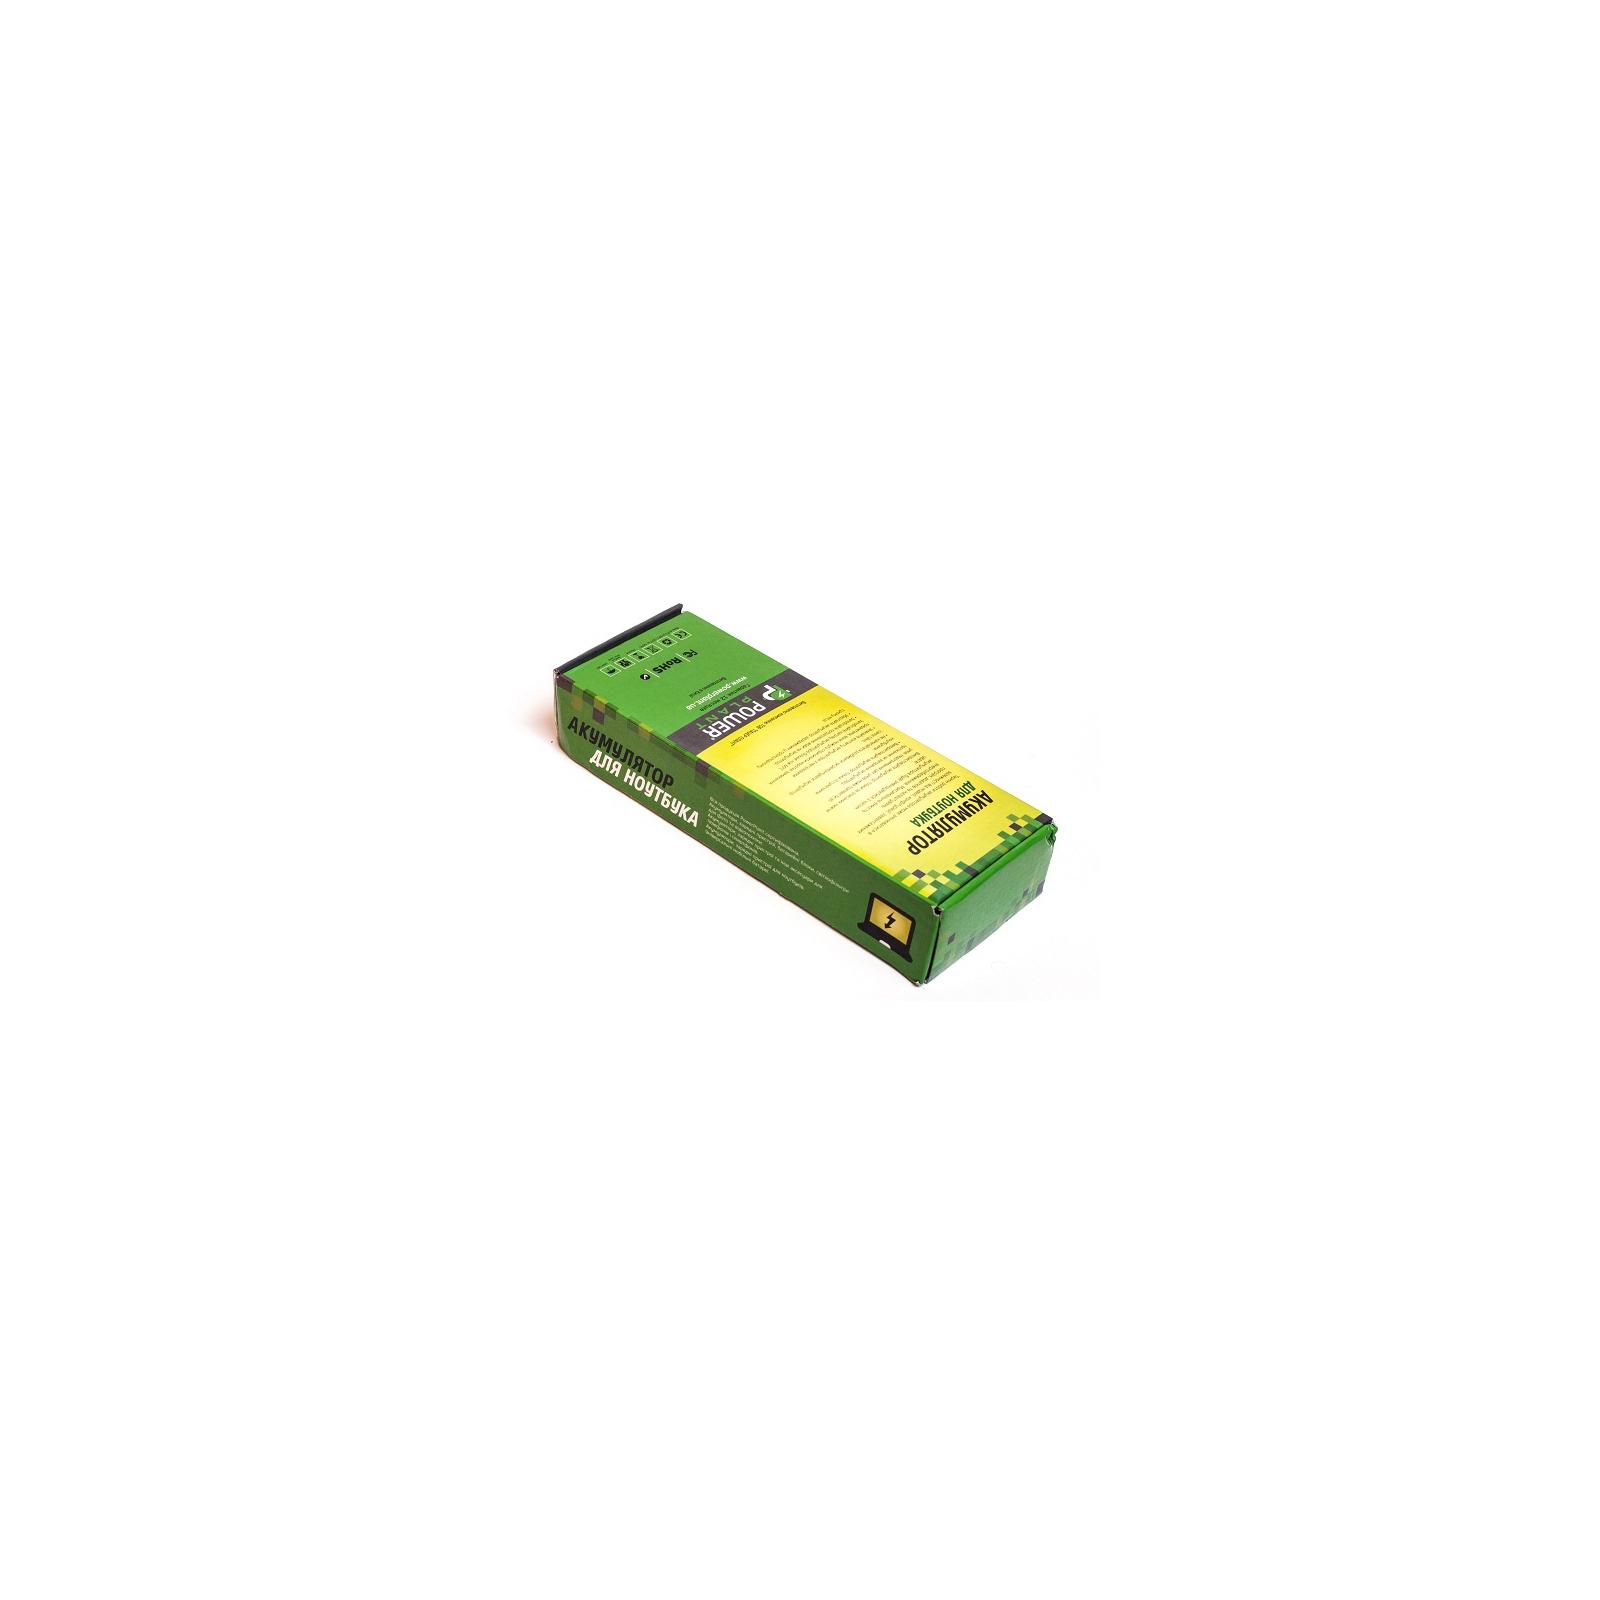 Аккумулятор для ноутбука HP Presario 2100 (H NC6120 3S2P HSTNN-UB08) 10.8V 5200mAh PowerPlant (NB00000020) изображение 2